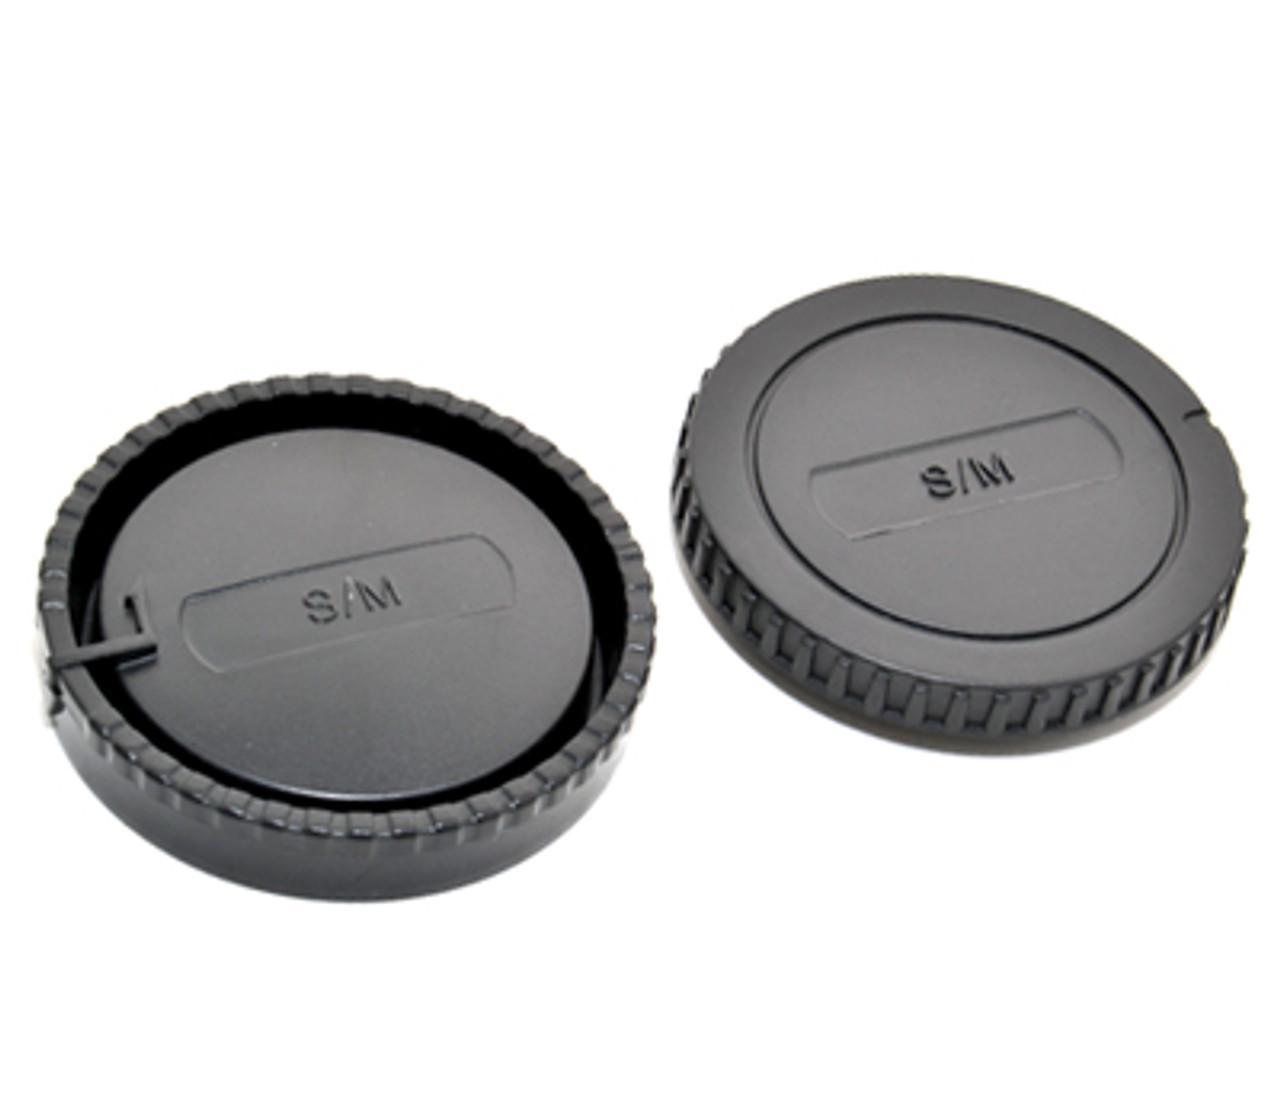 JJC L-R6 Front/Rear Lens Caps for Sony/Minolta